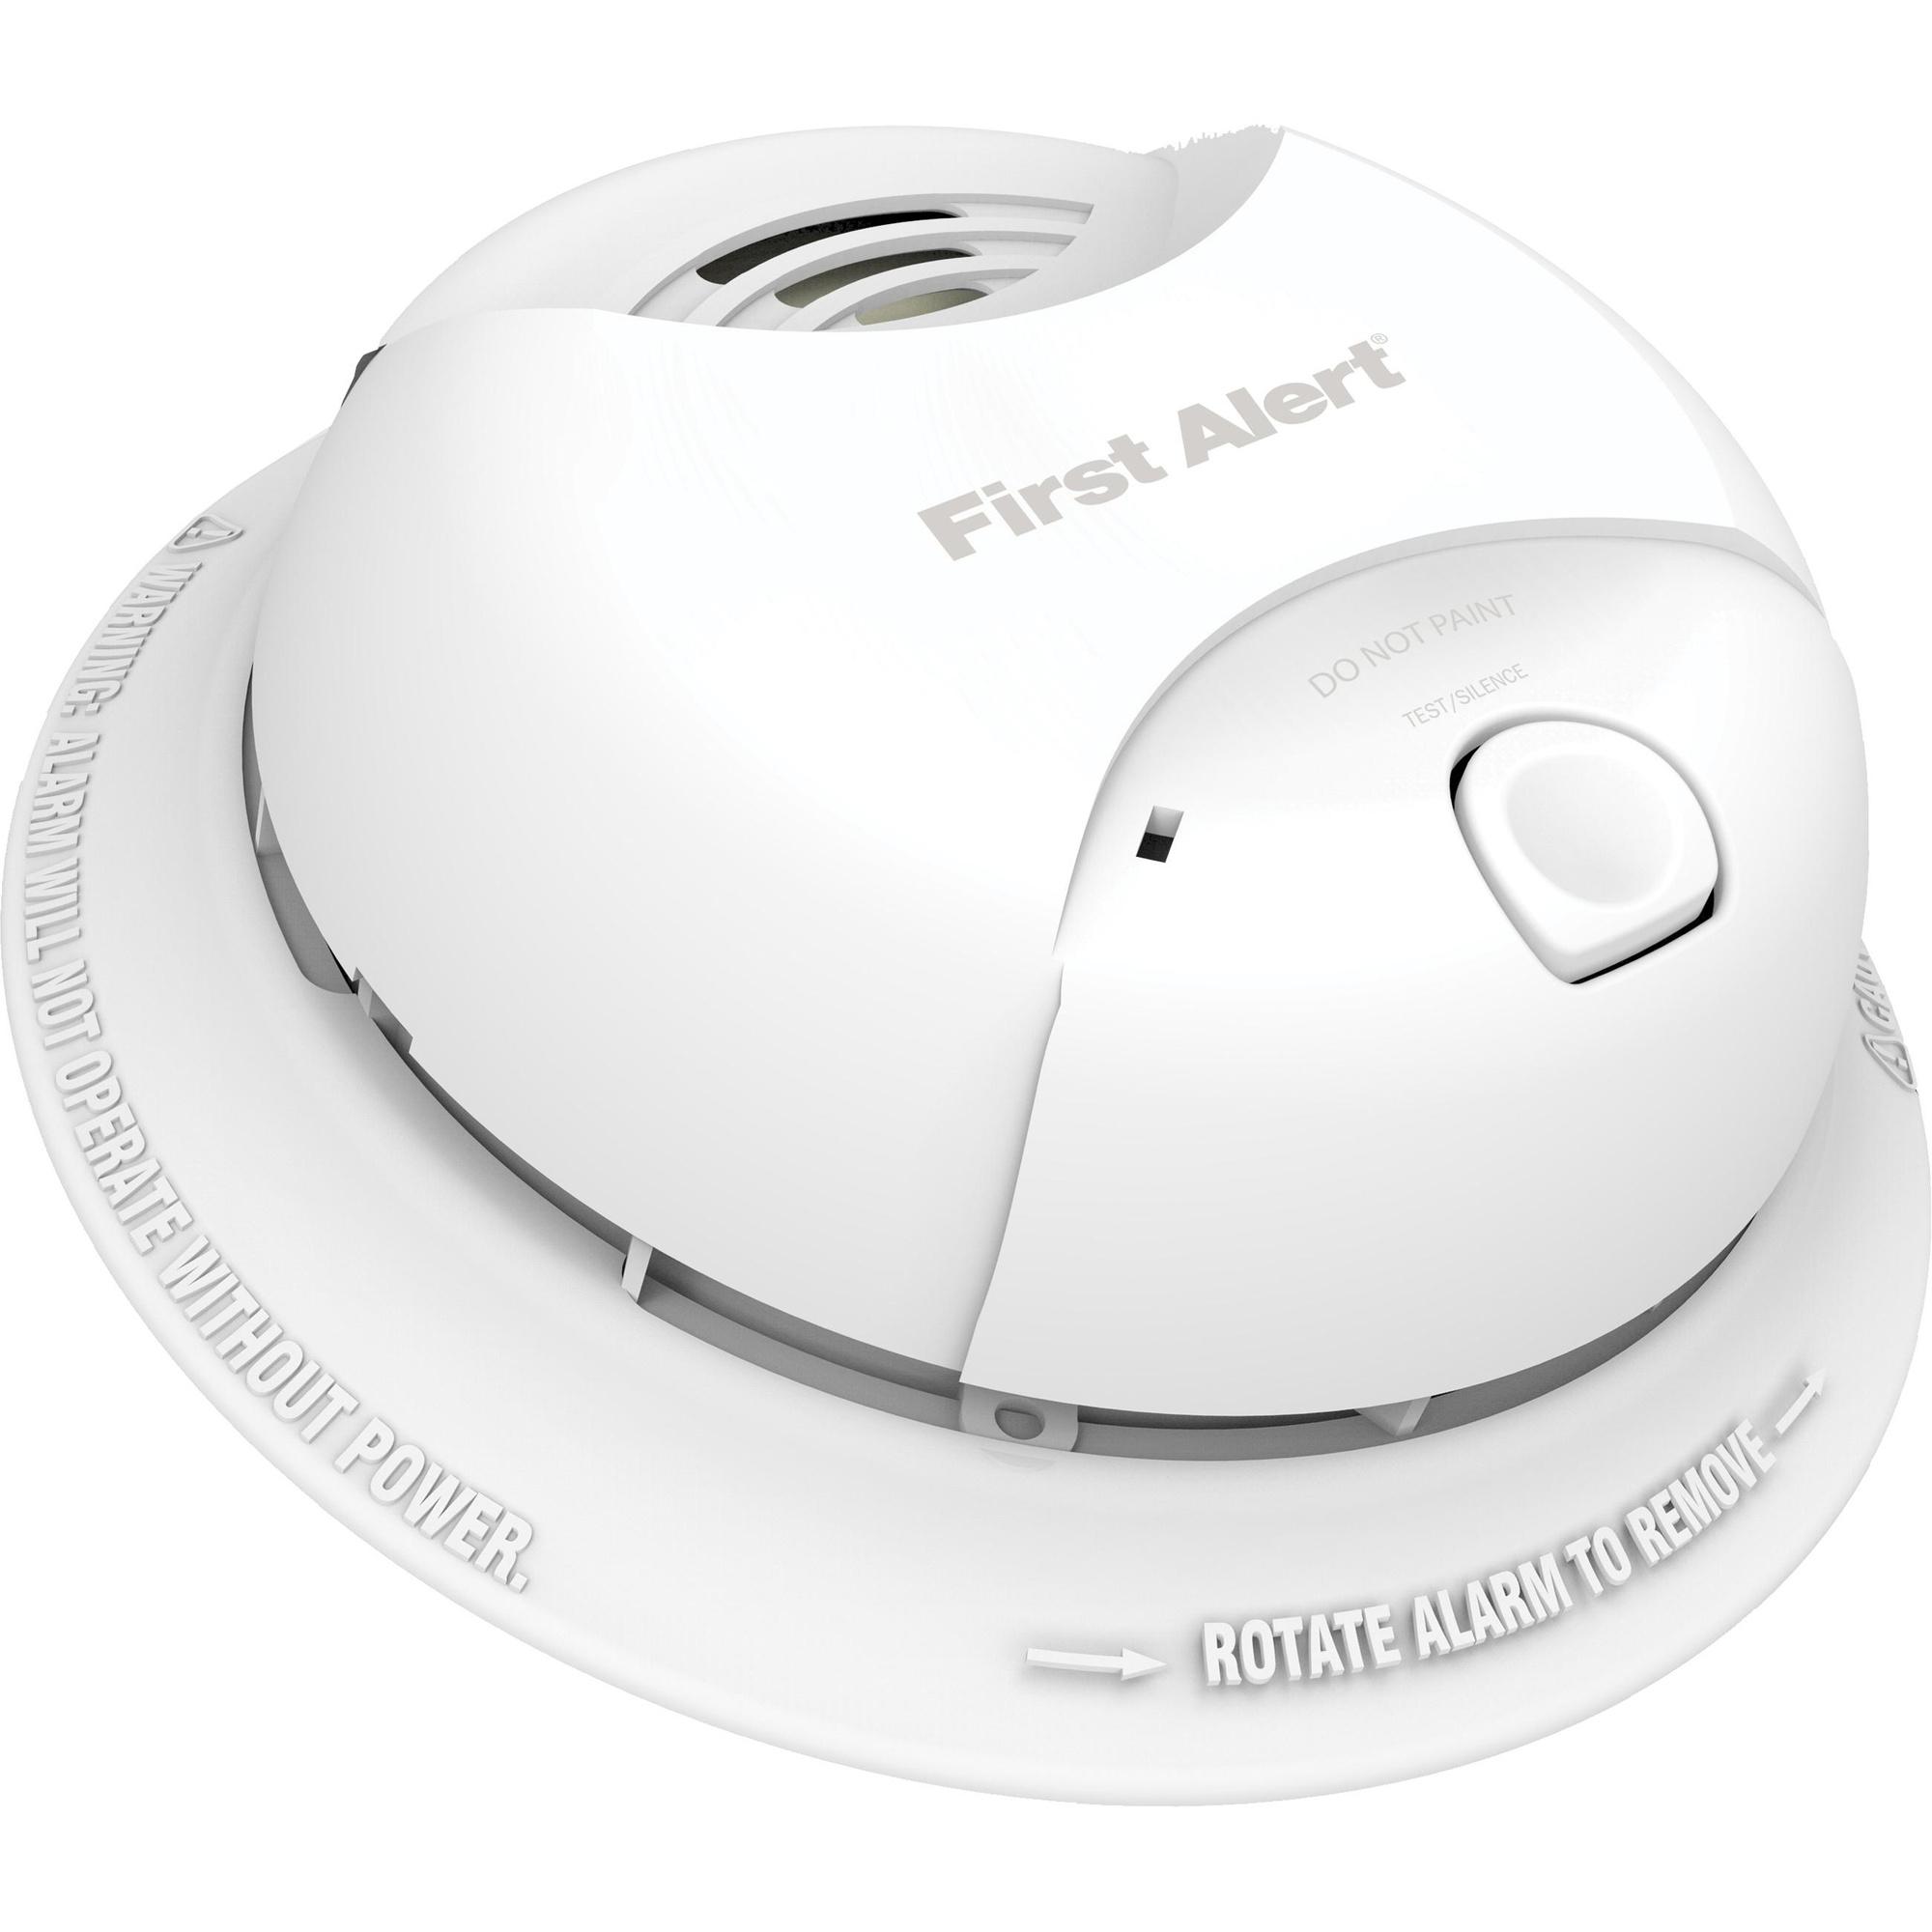 brk sa350b single station dual ionization smoke alarm 9. Black Bedroom Furniture Sets. Home Design Ideas